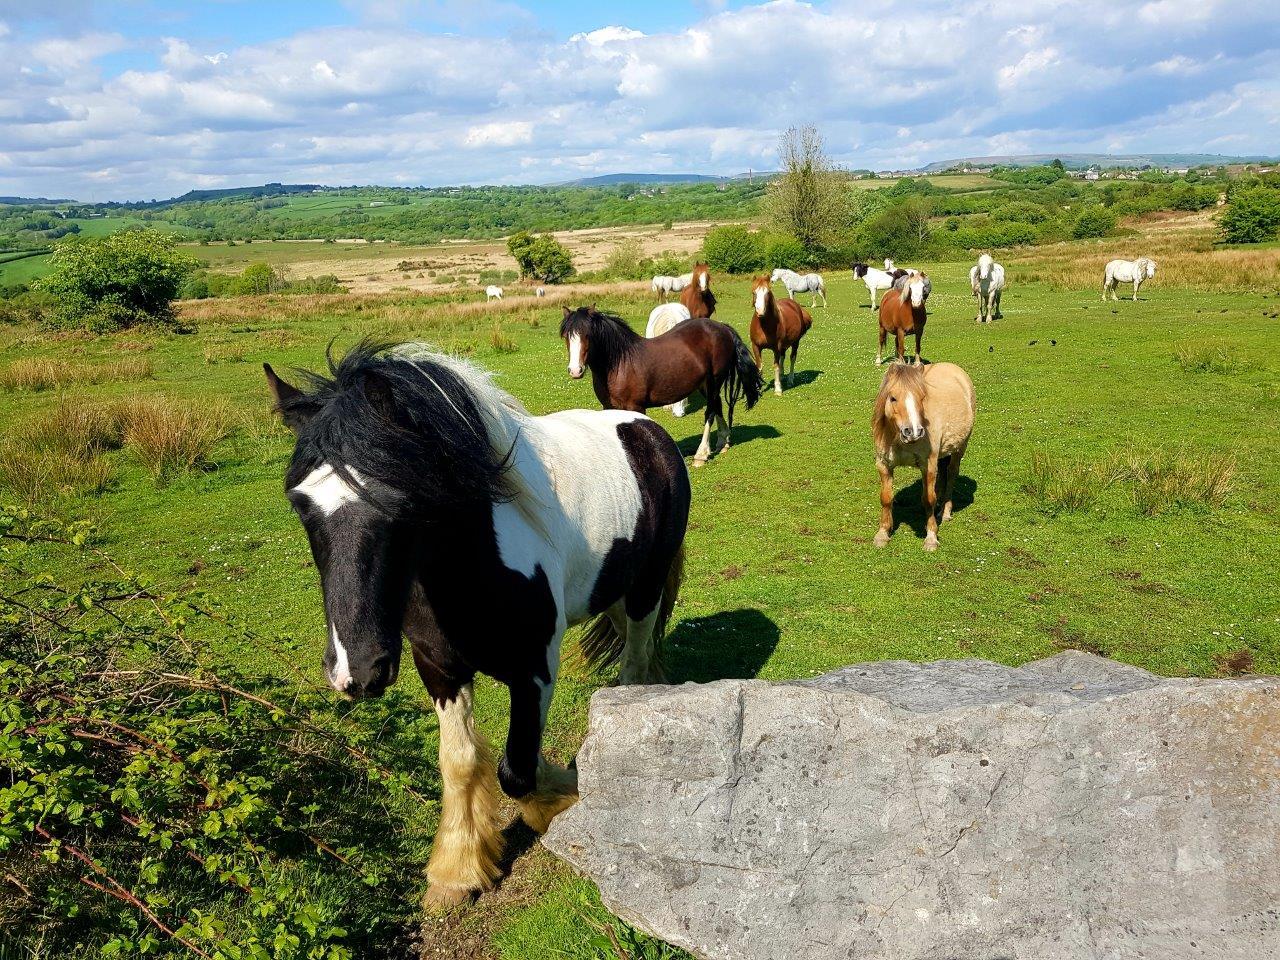 Horses on Llantrisant Common VL